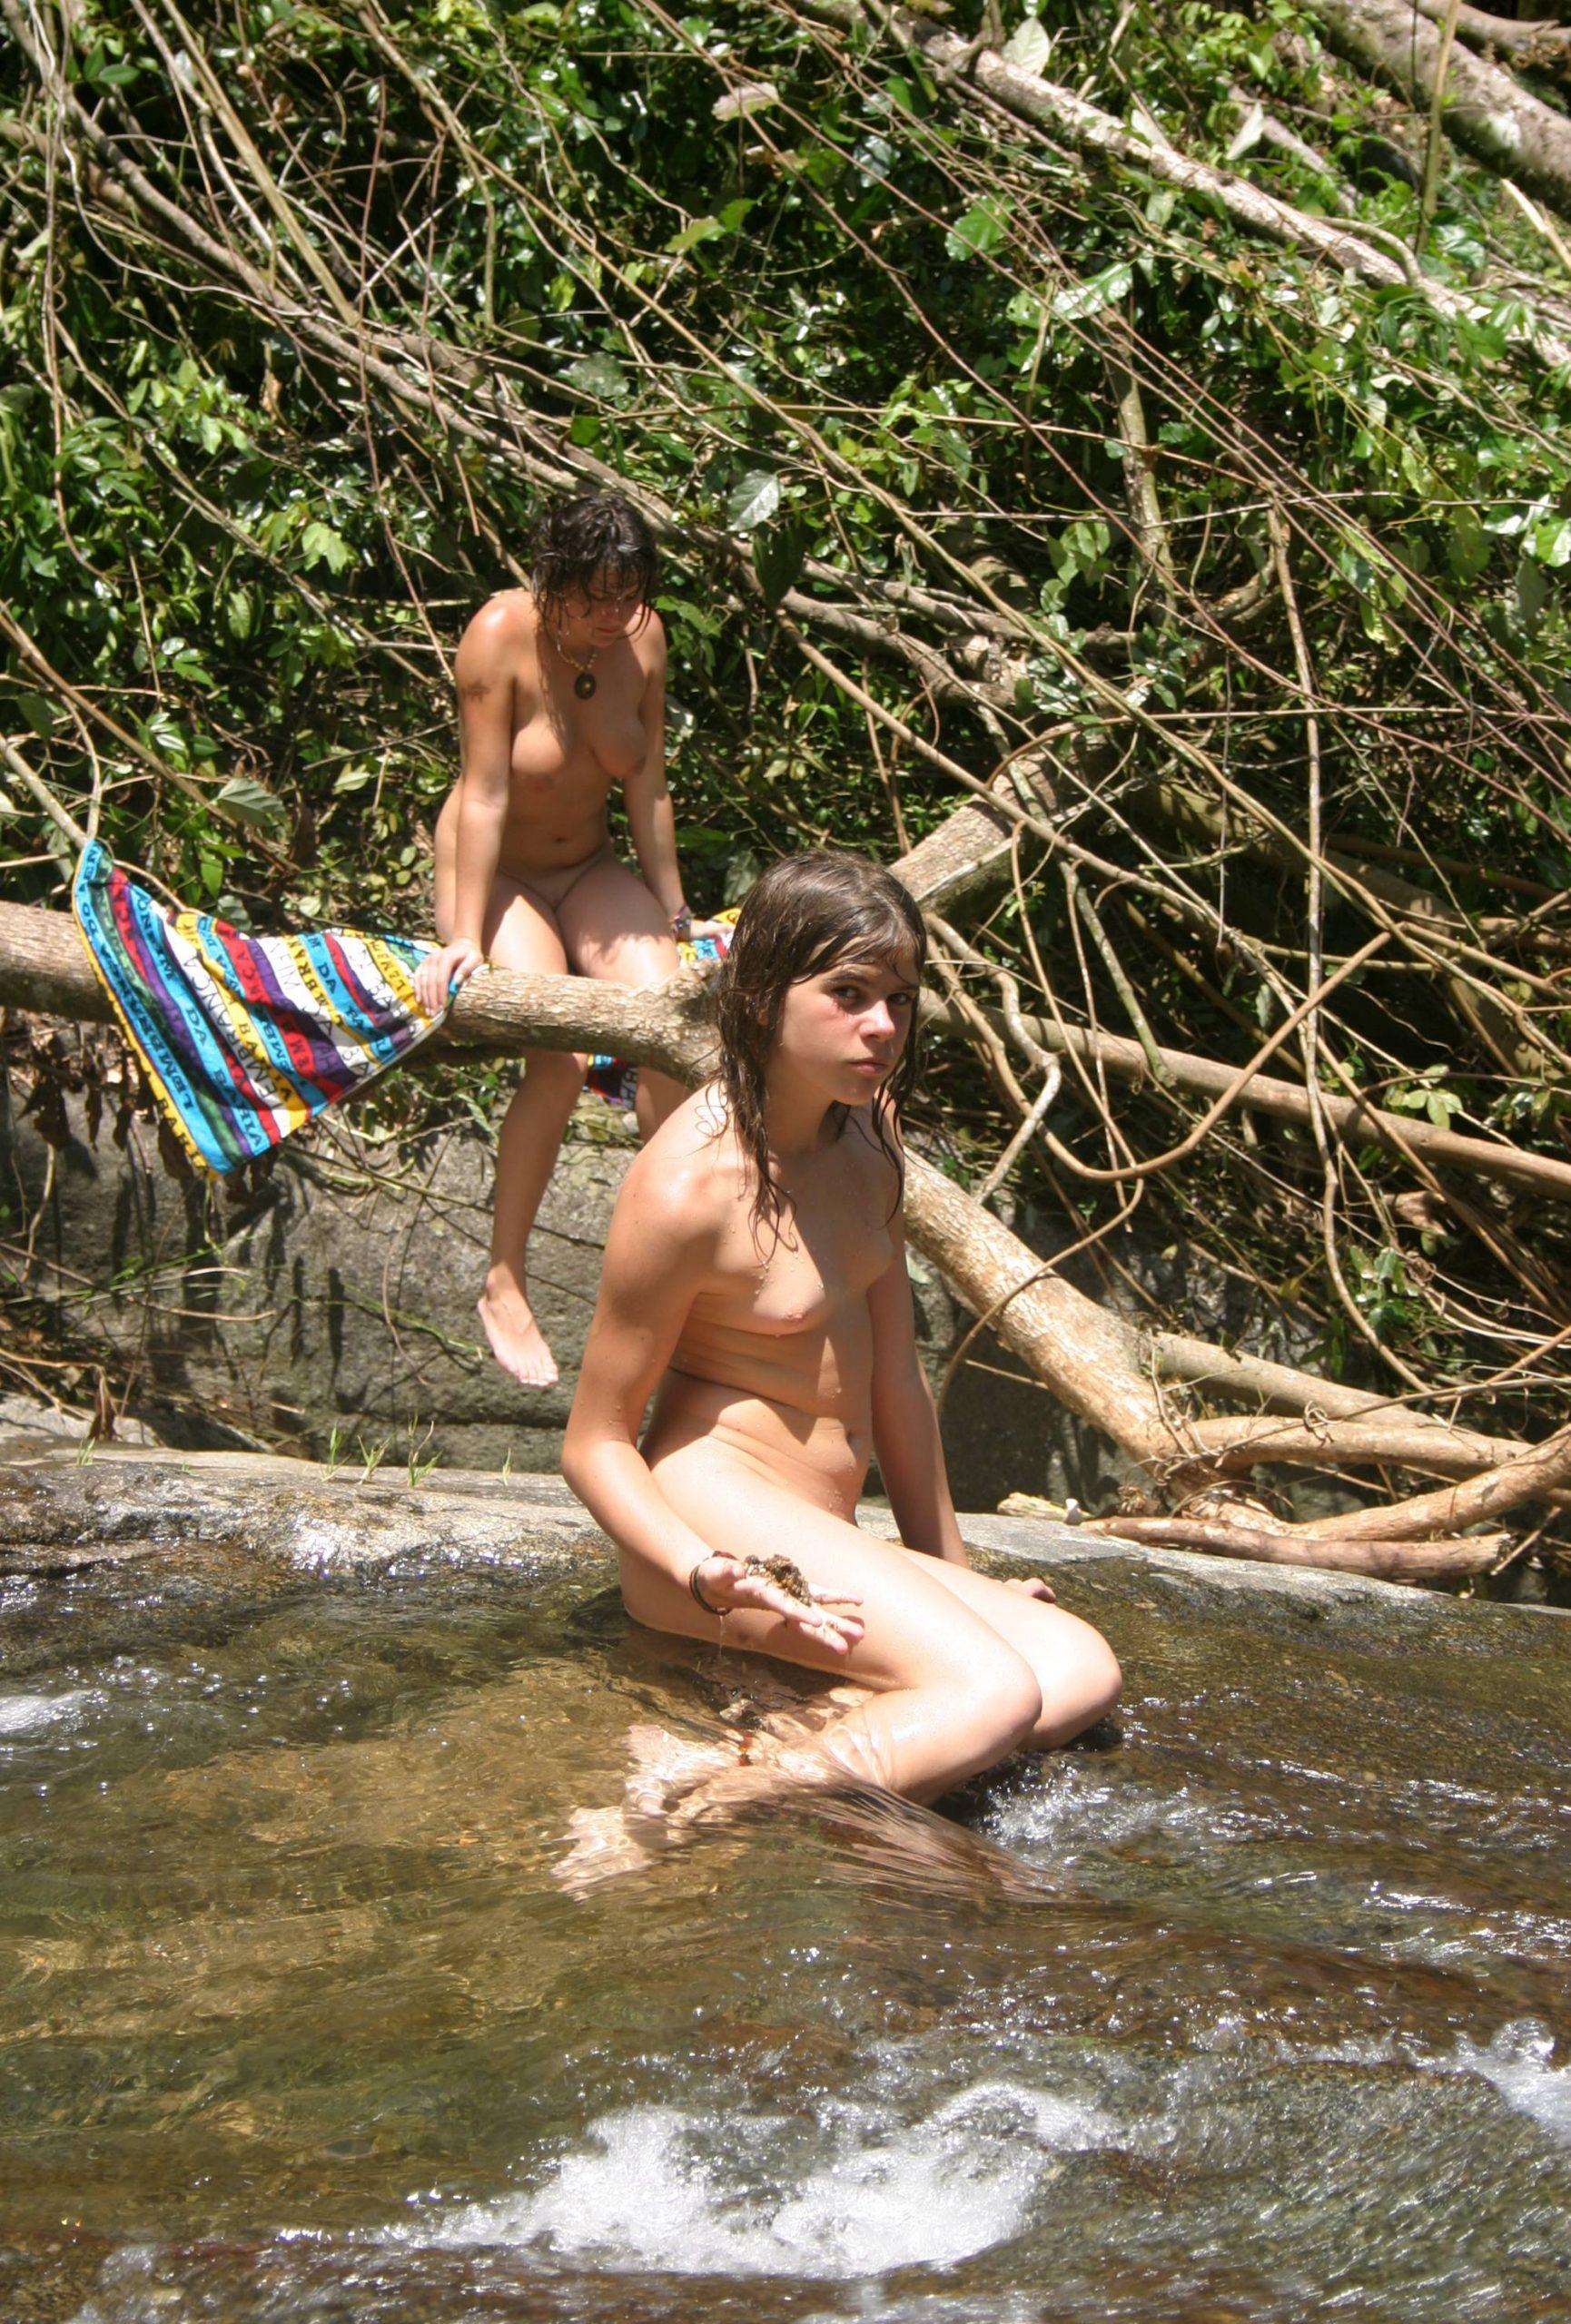 Purenudism Pics-Brazilian Top of the Rivers - 3